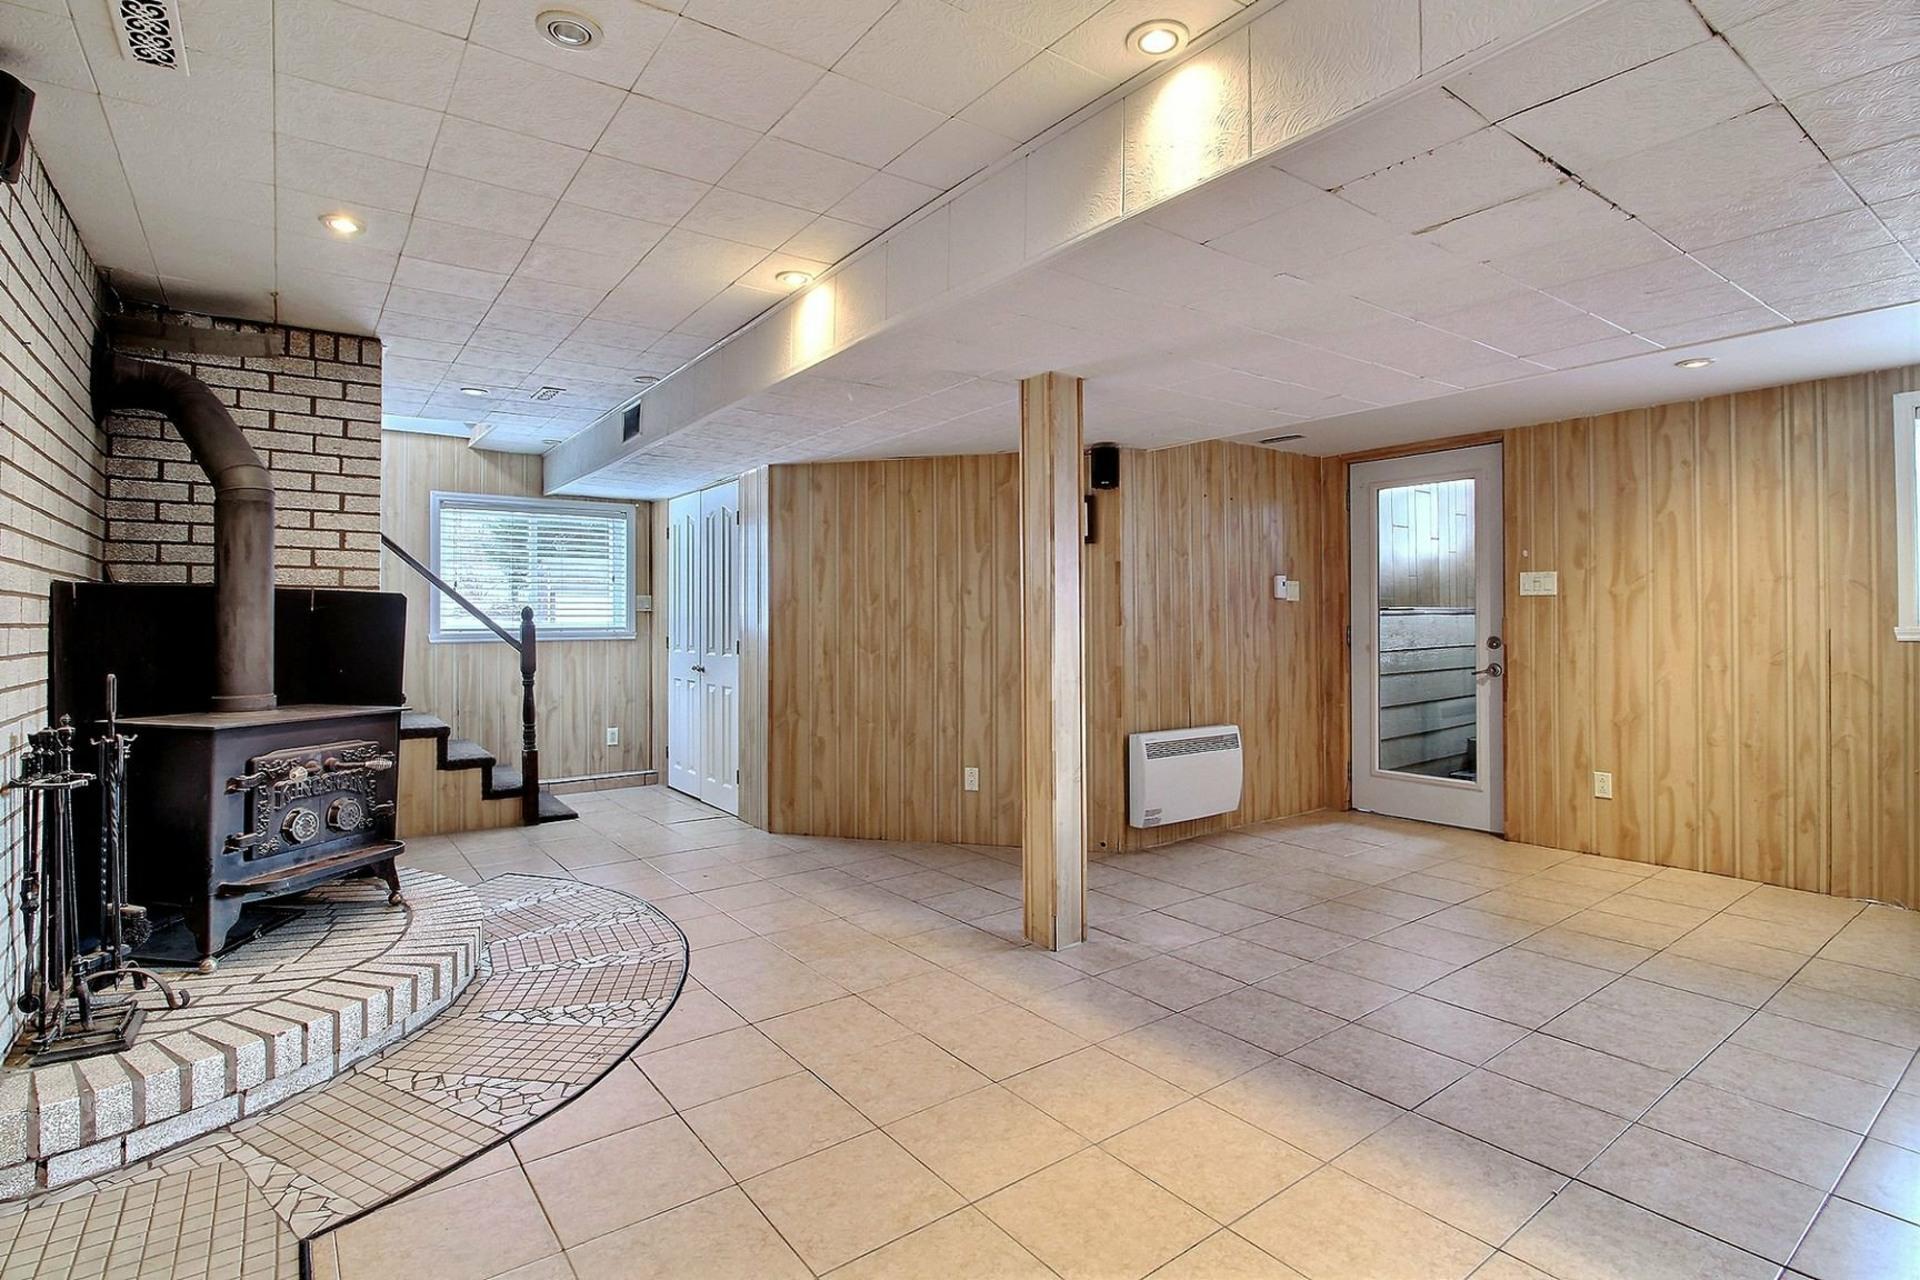 image 19 - House For sale Sainte-Sophie - 10 rooms